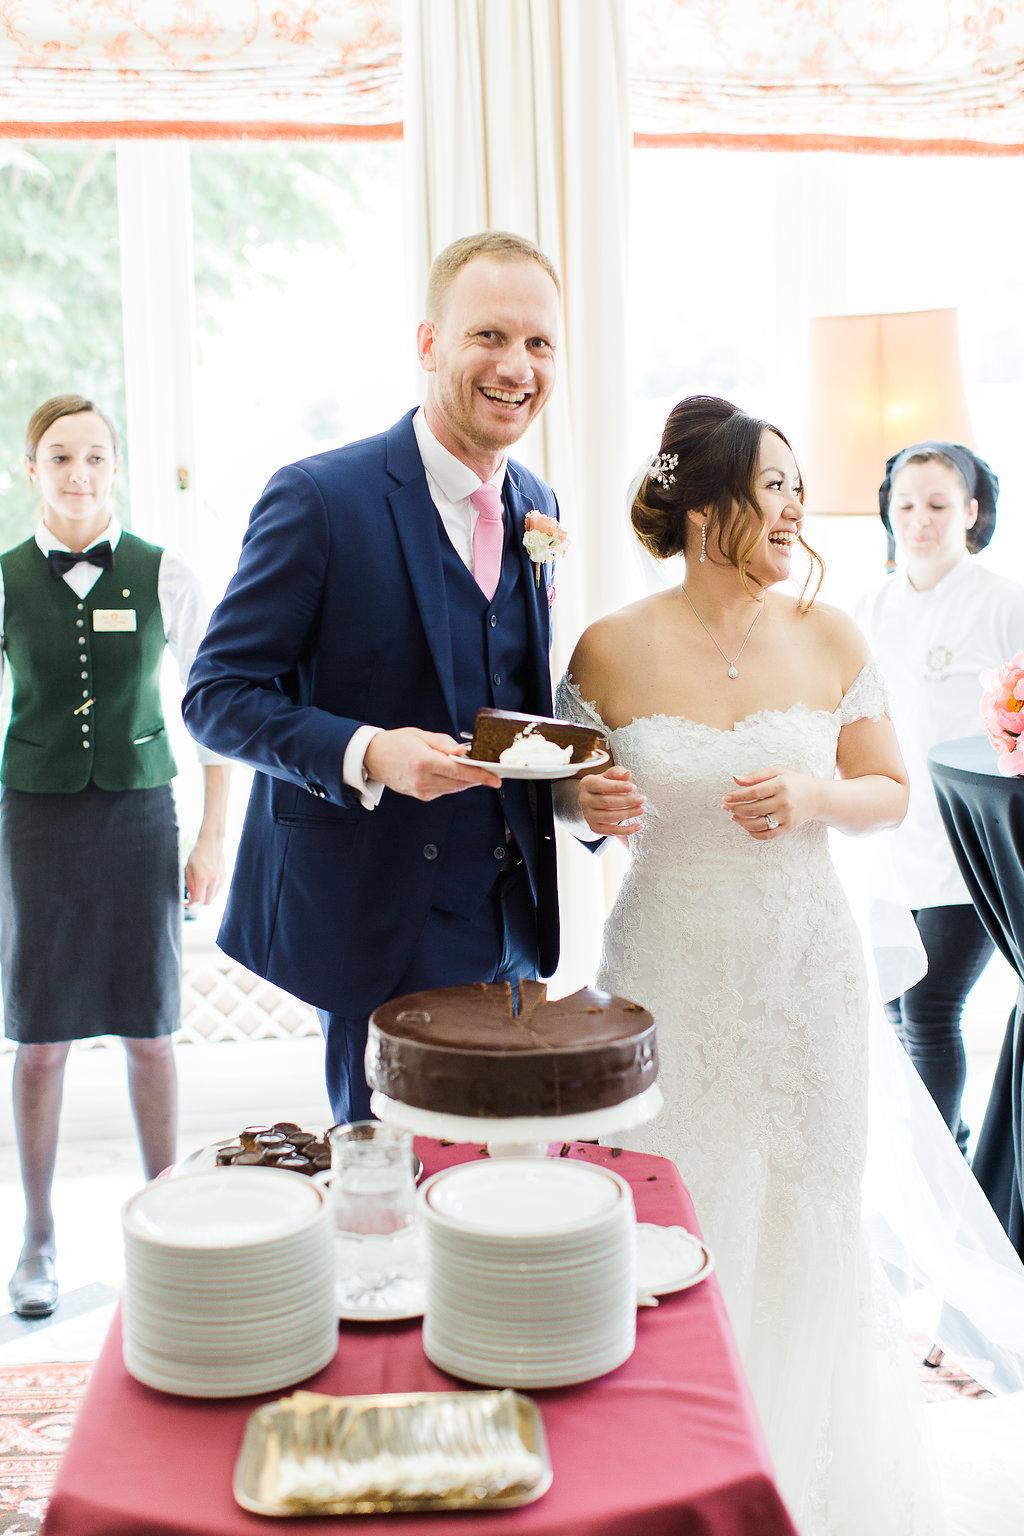 Luxe Navy and Pink Wedding at Schloss Fuschl in Austria by Tanja Kibogo21.JPG